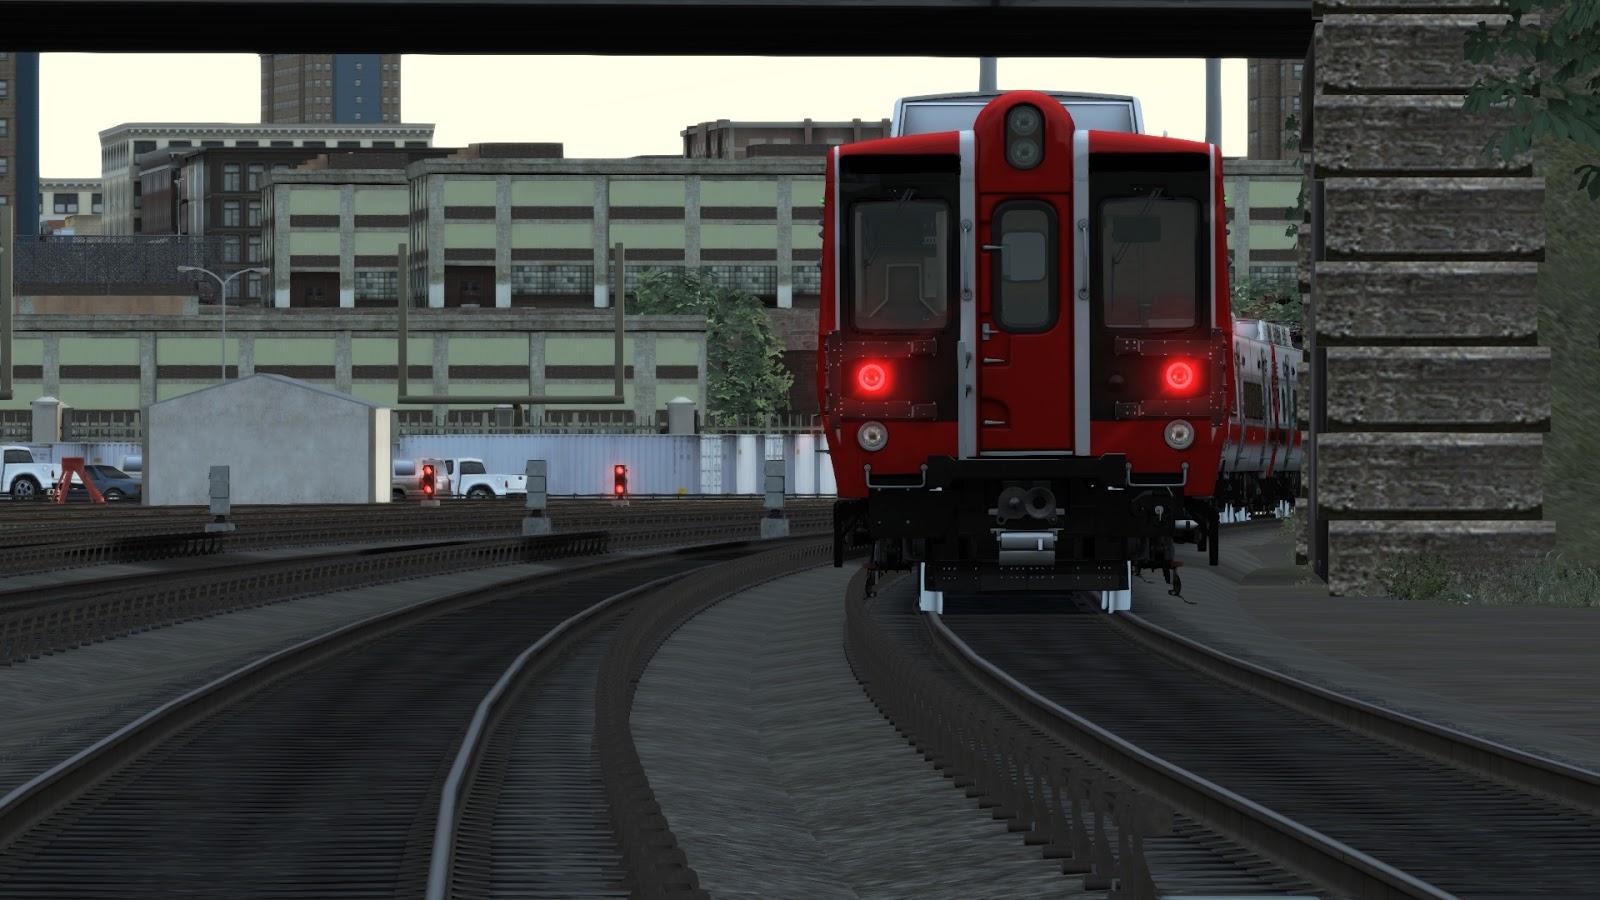 TrainKidKris: Openbve Pics, NYC Subway information and Railroads